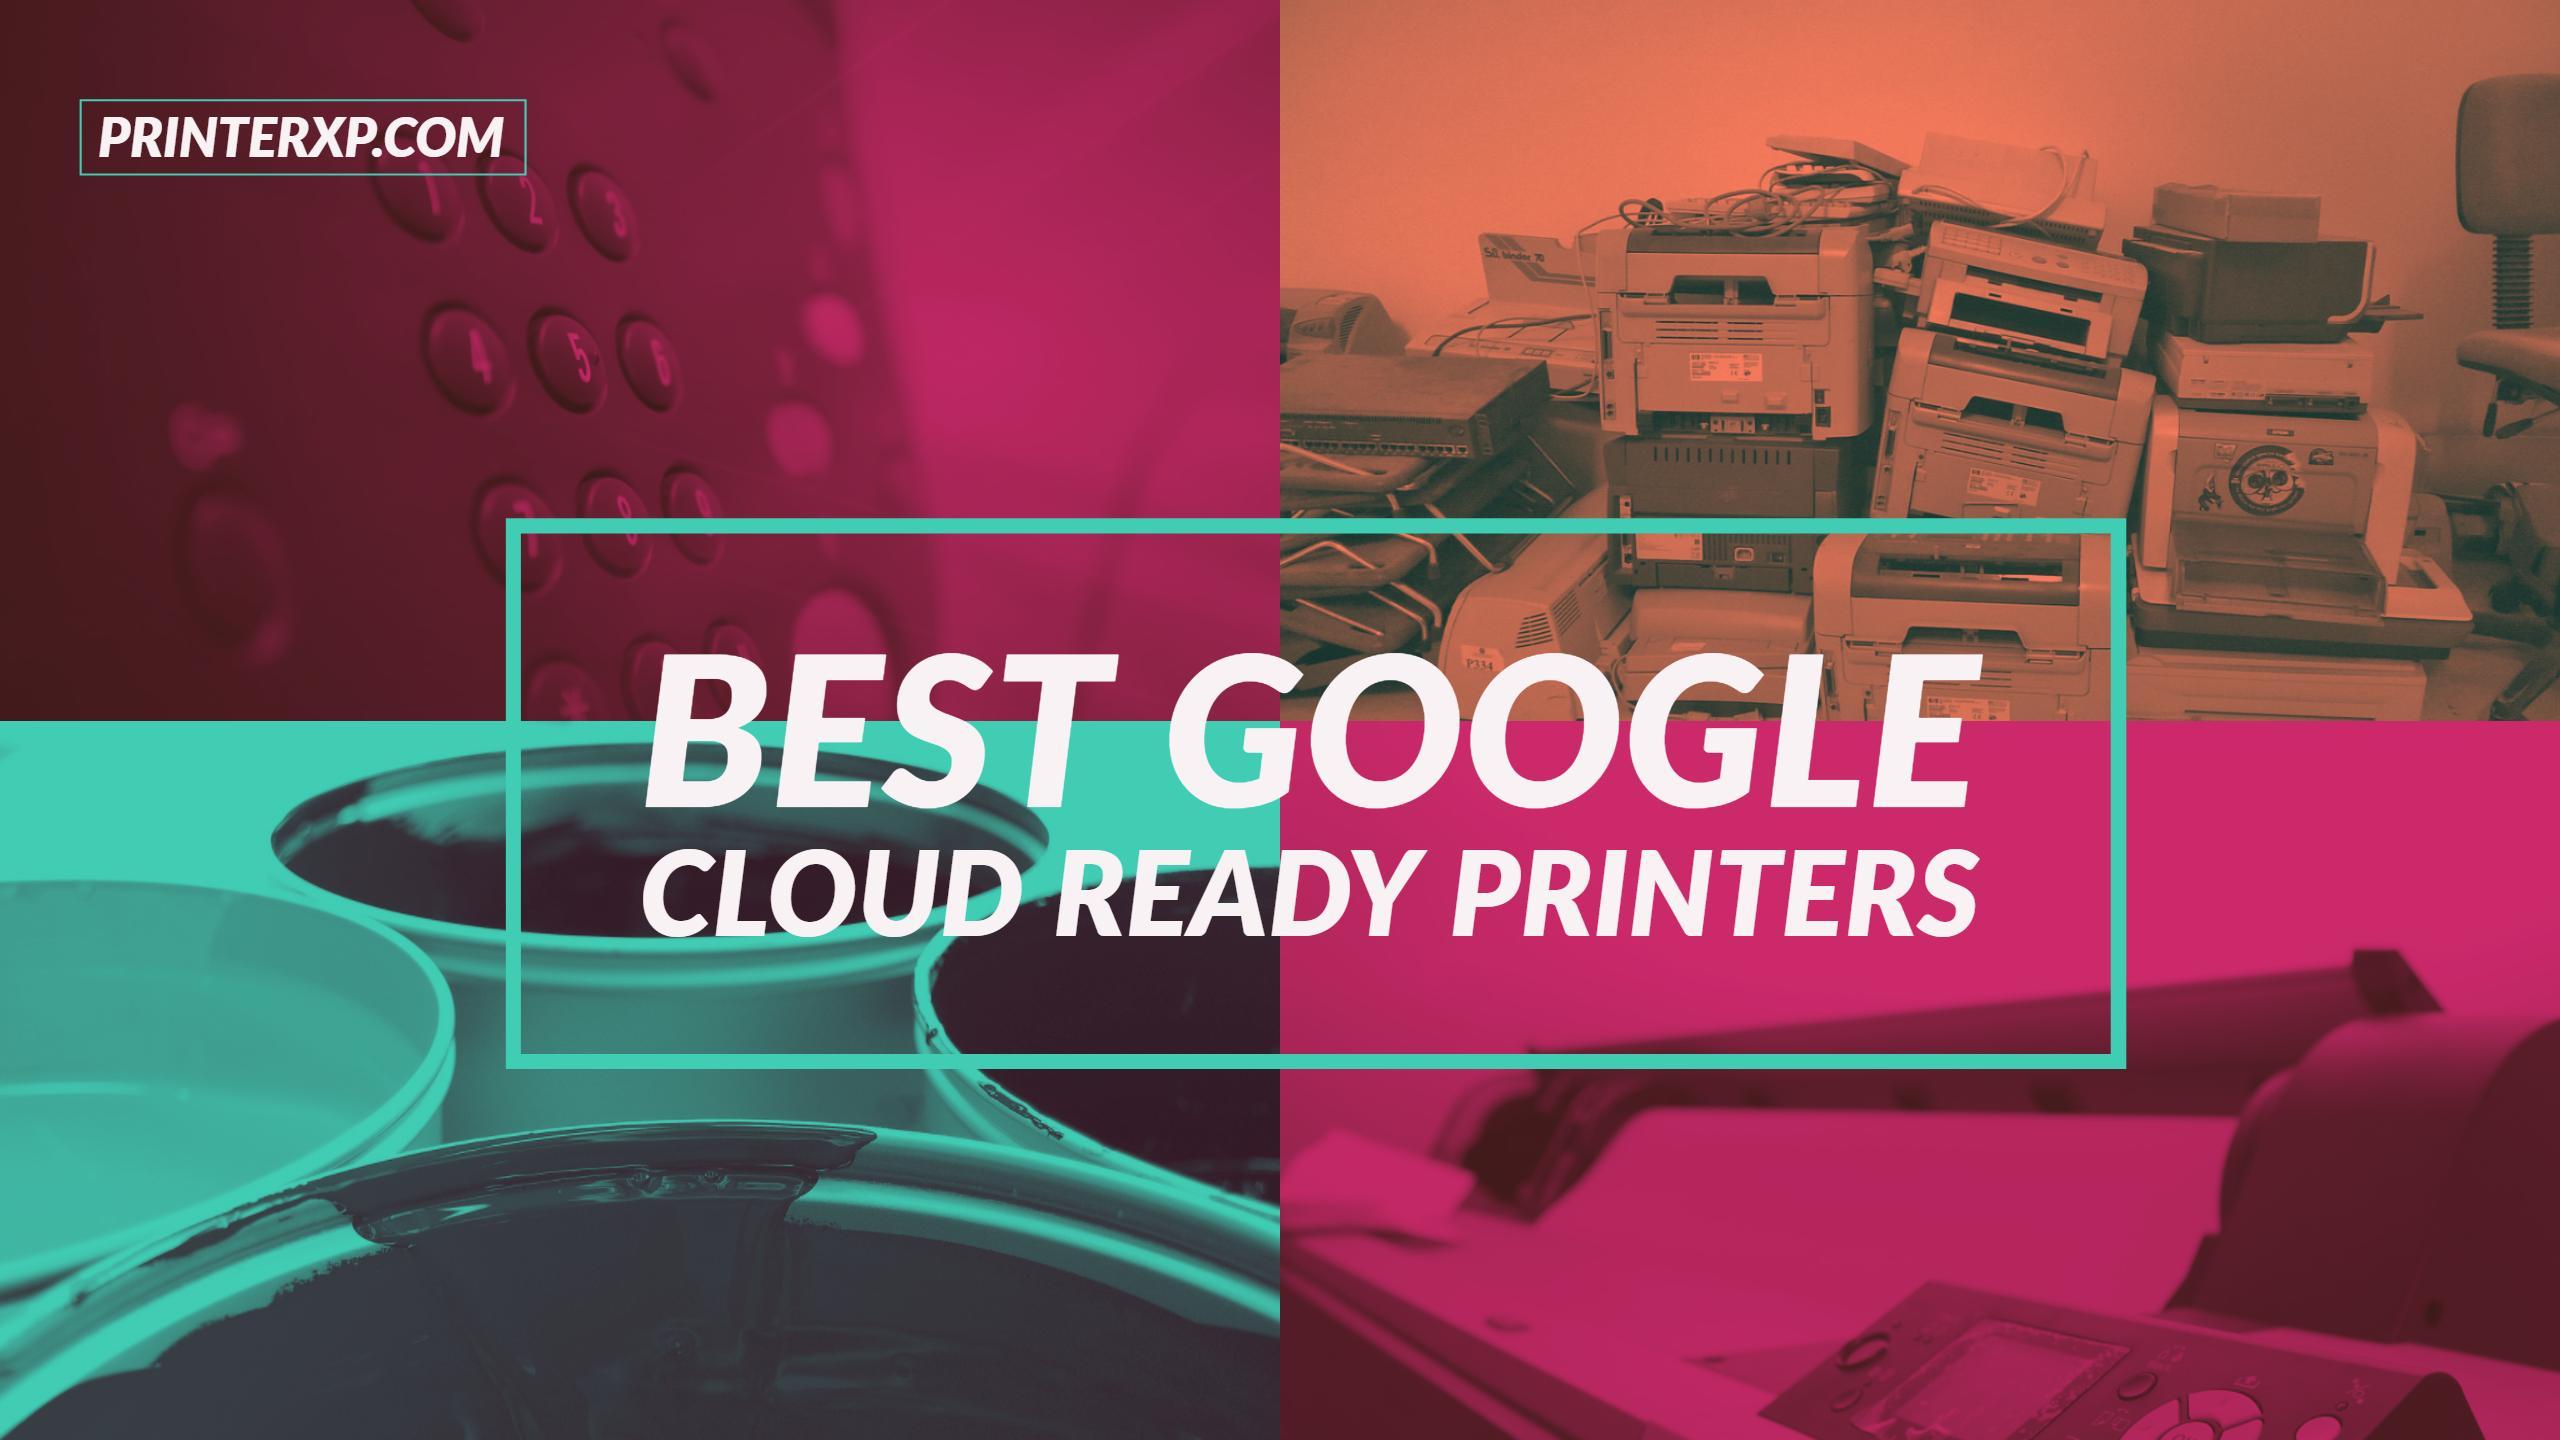 Best Google Cloud Ready Printers